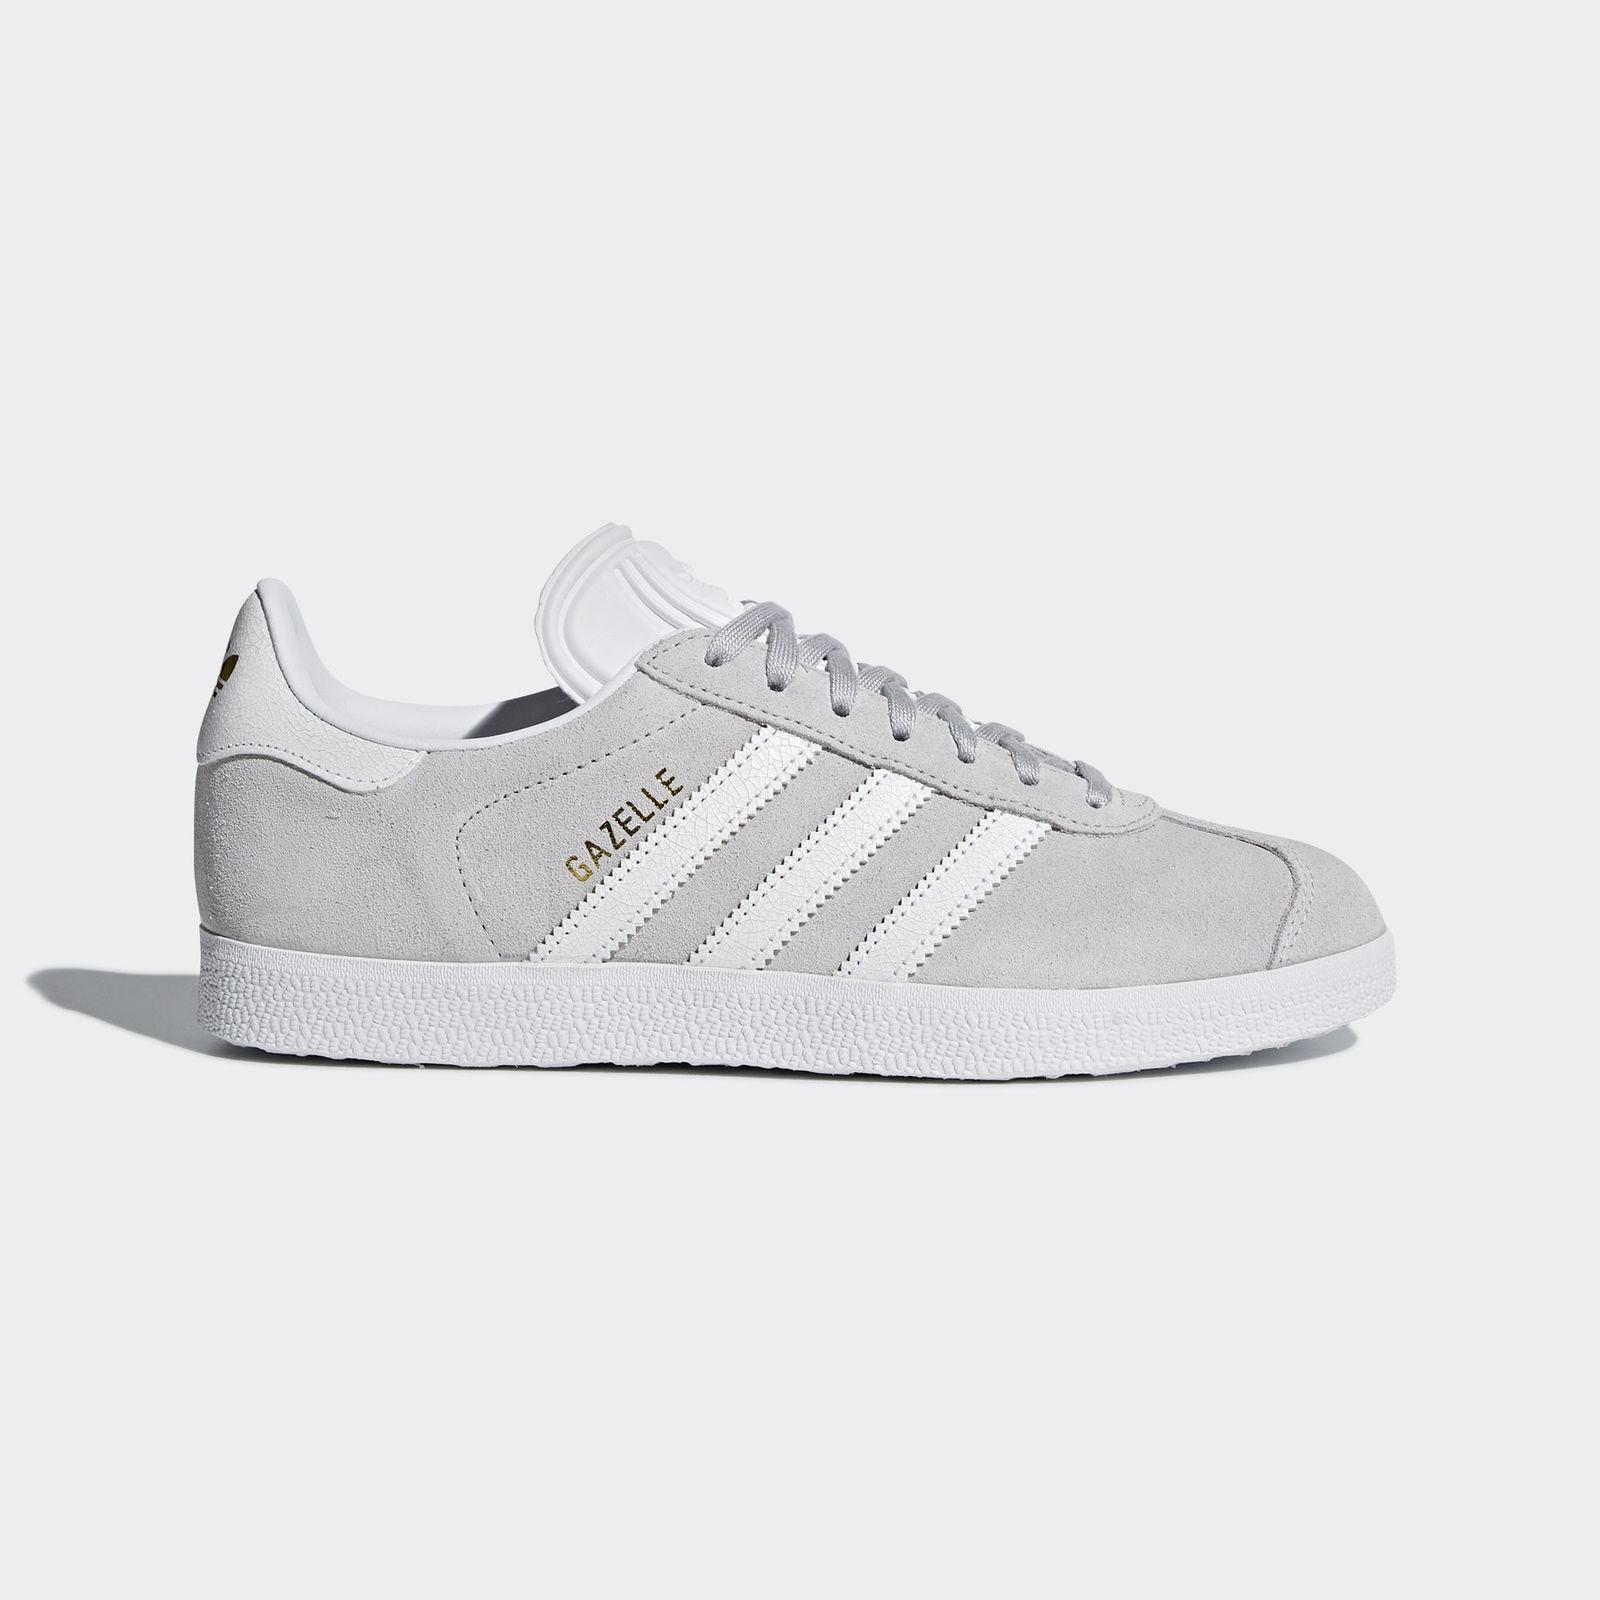 Adidas Originals Gazelle W [B41659] Women Casual shoes Grey White